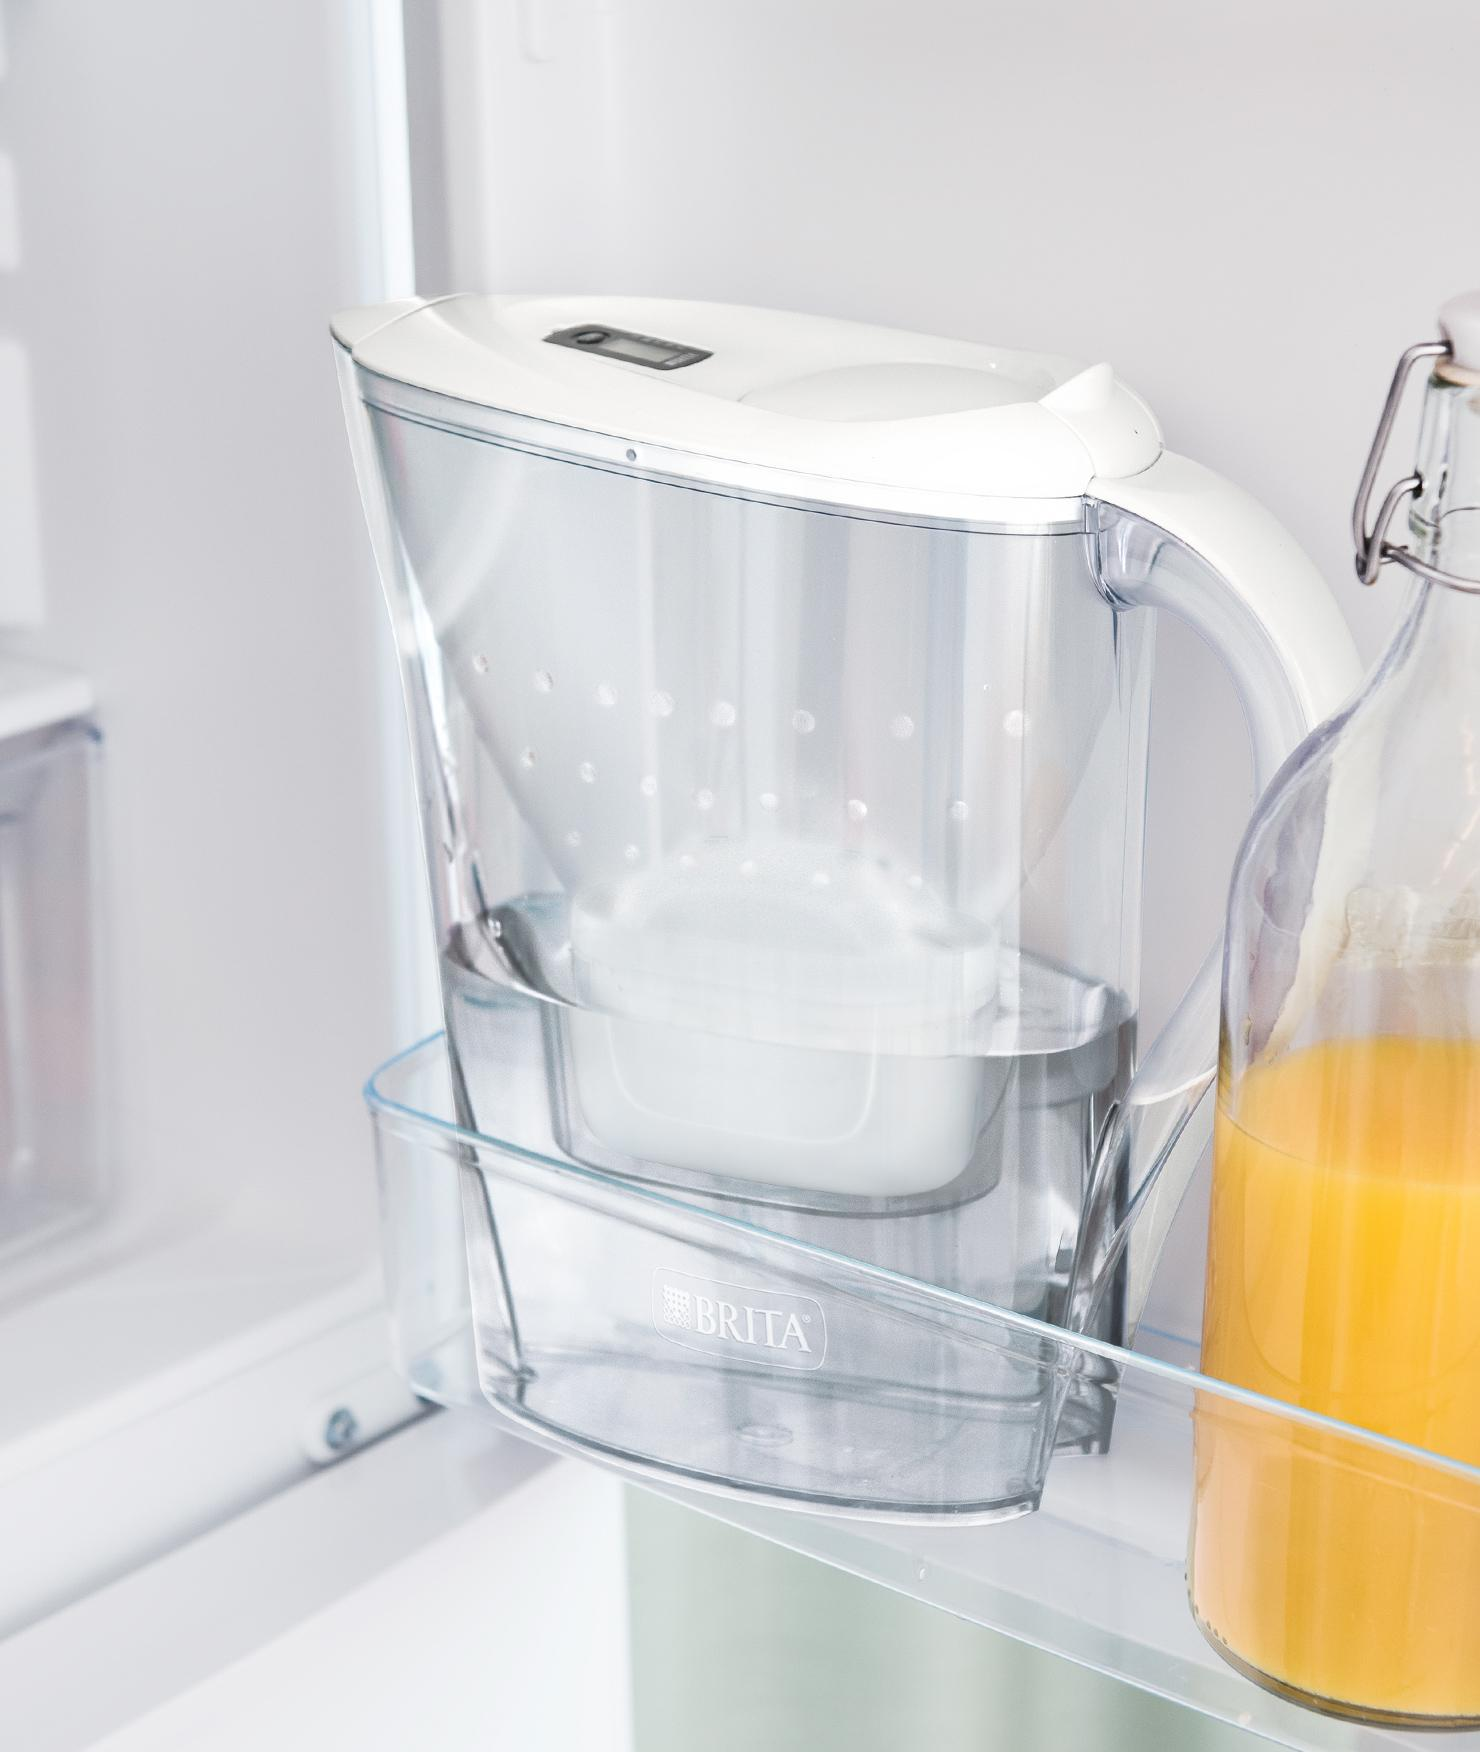 BRITA fill&enjoy Marella Cool white:Kühlschranktür